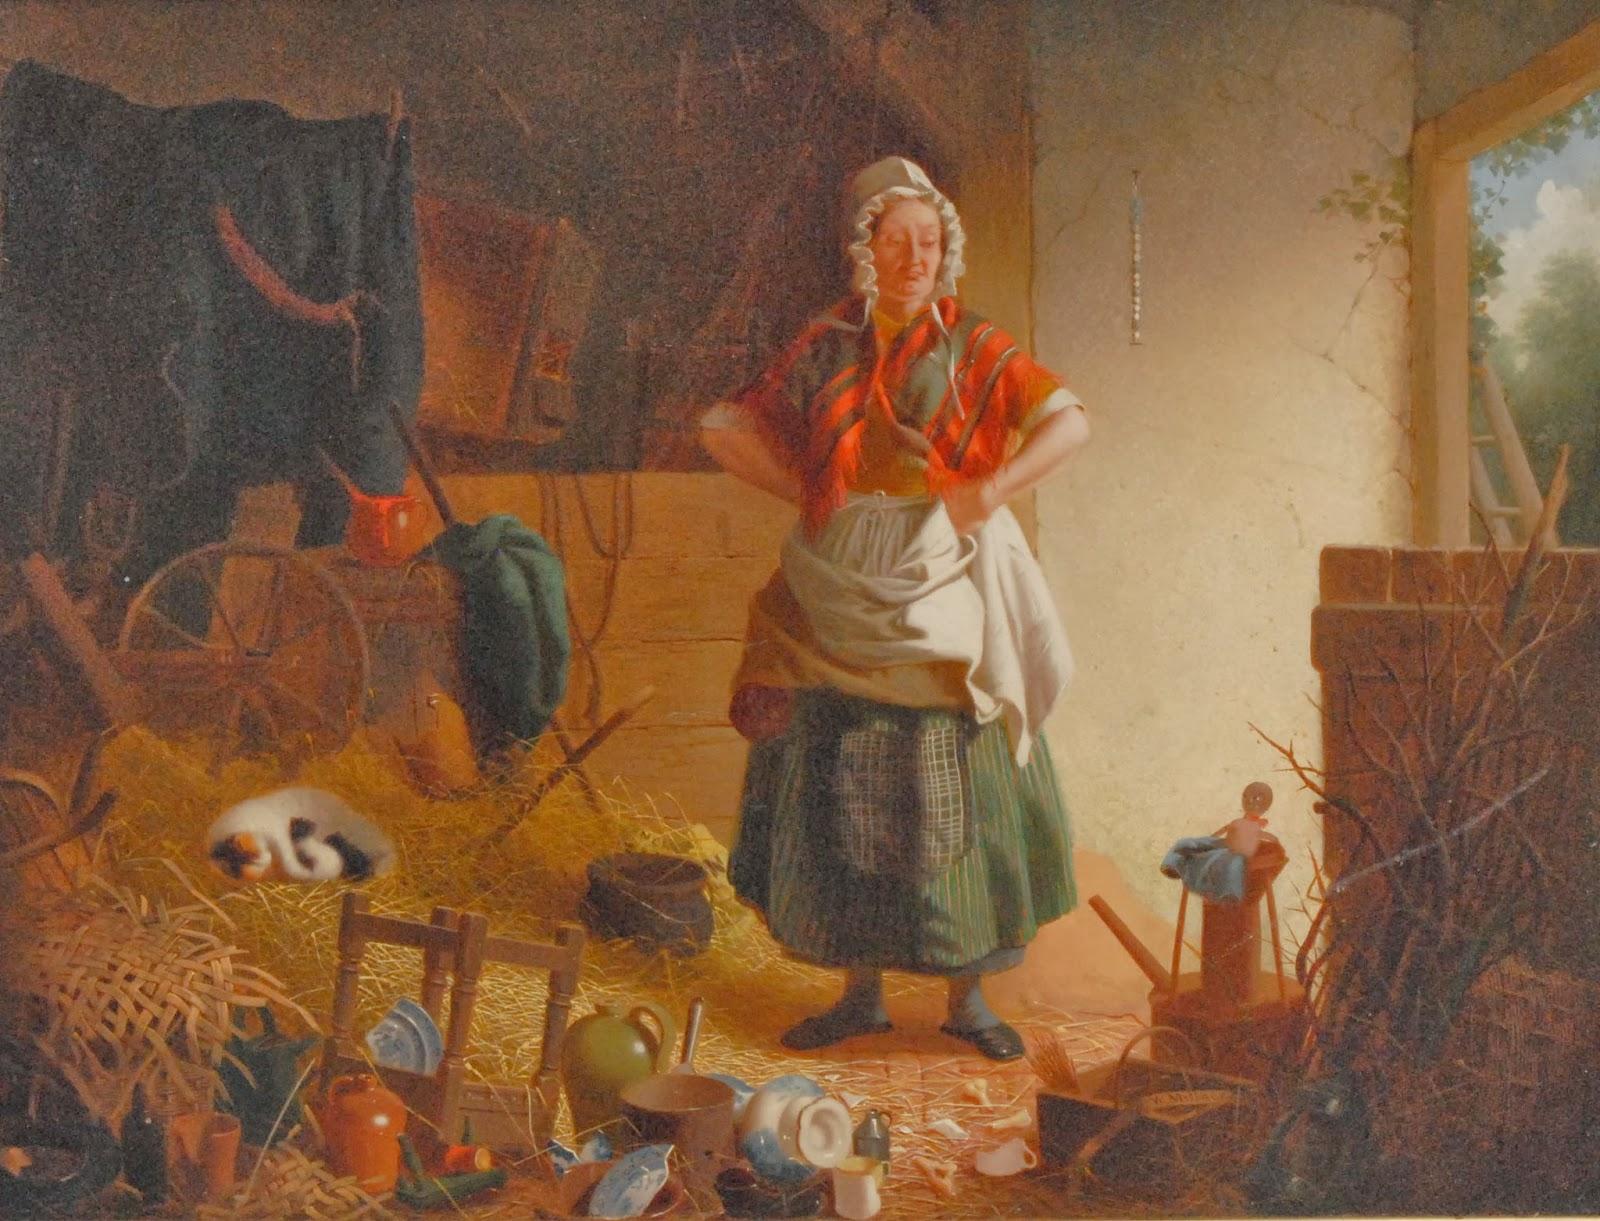 5 William Edward Millner - Devastation in the Barn.jpg